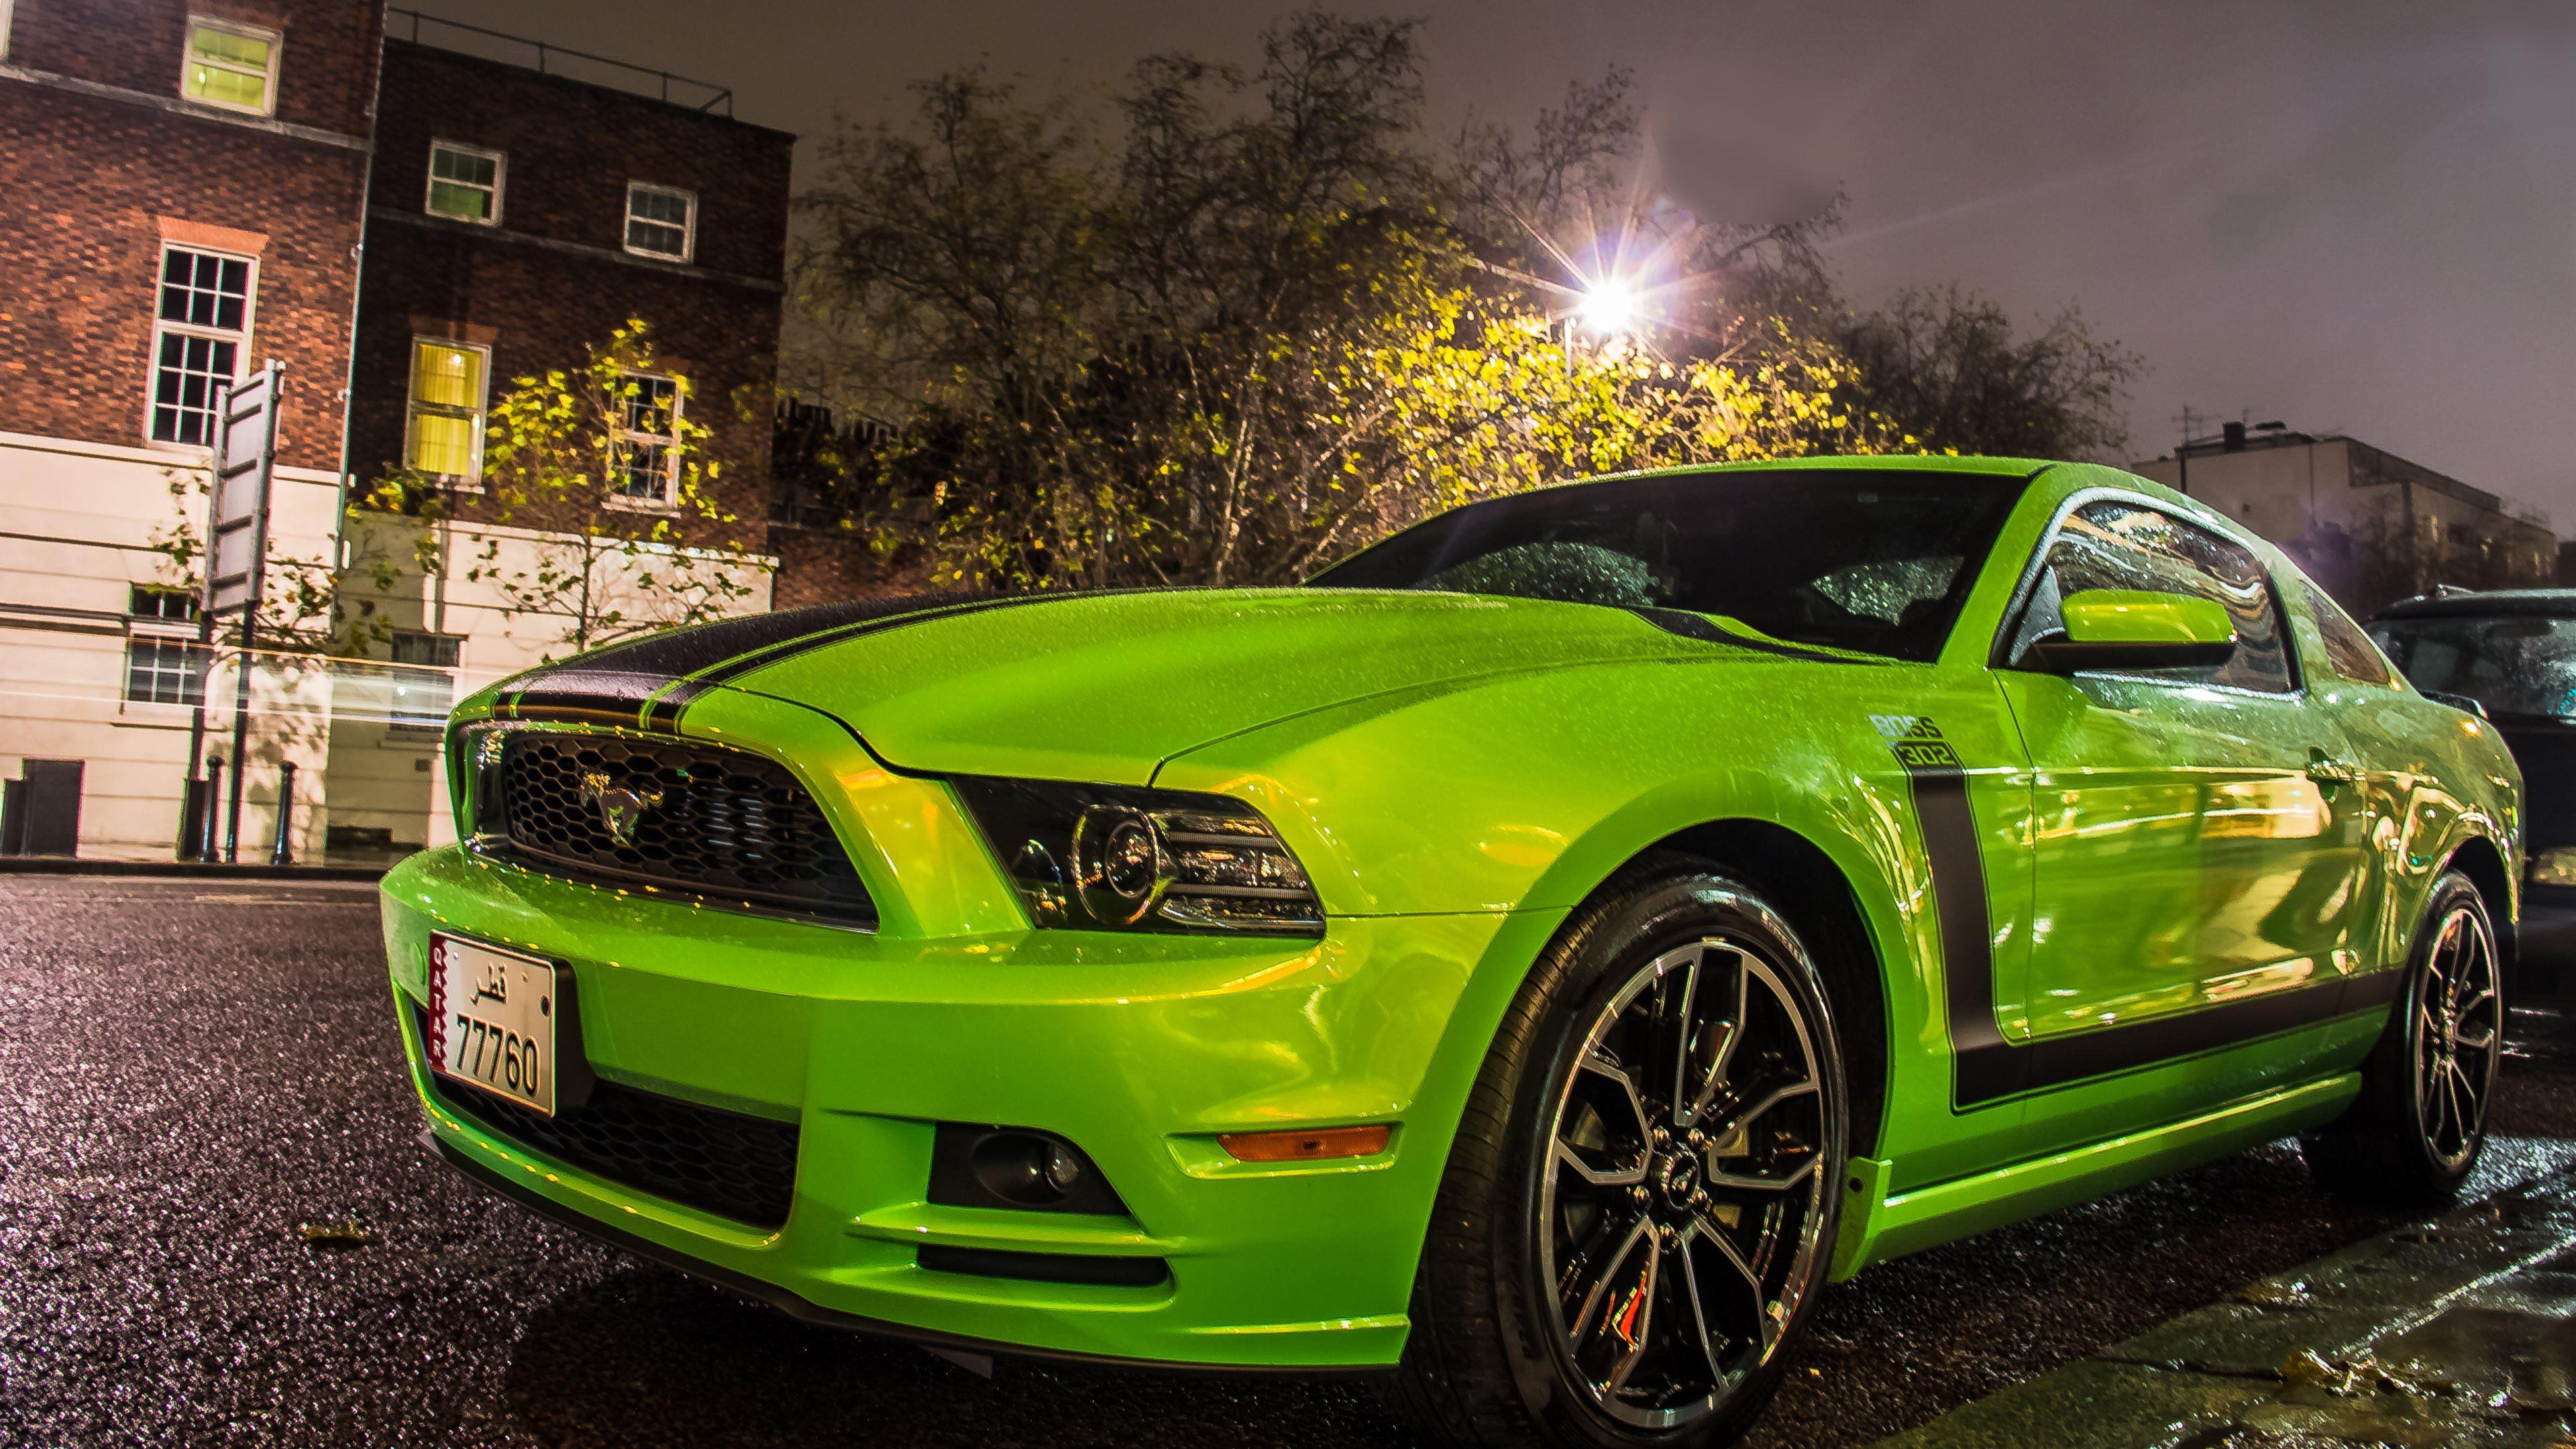 Véhicules Ford Mustang  Véhicule Ford Fond d'écran